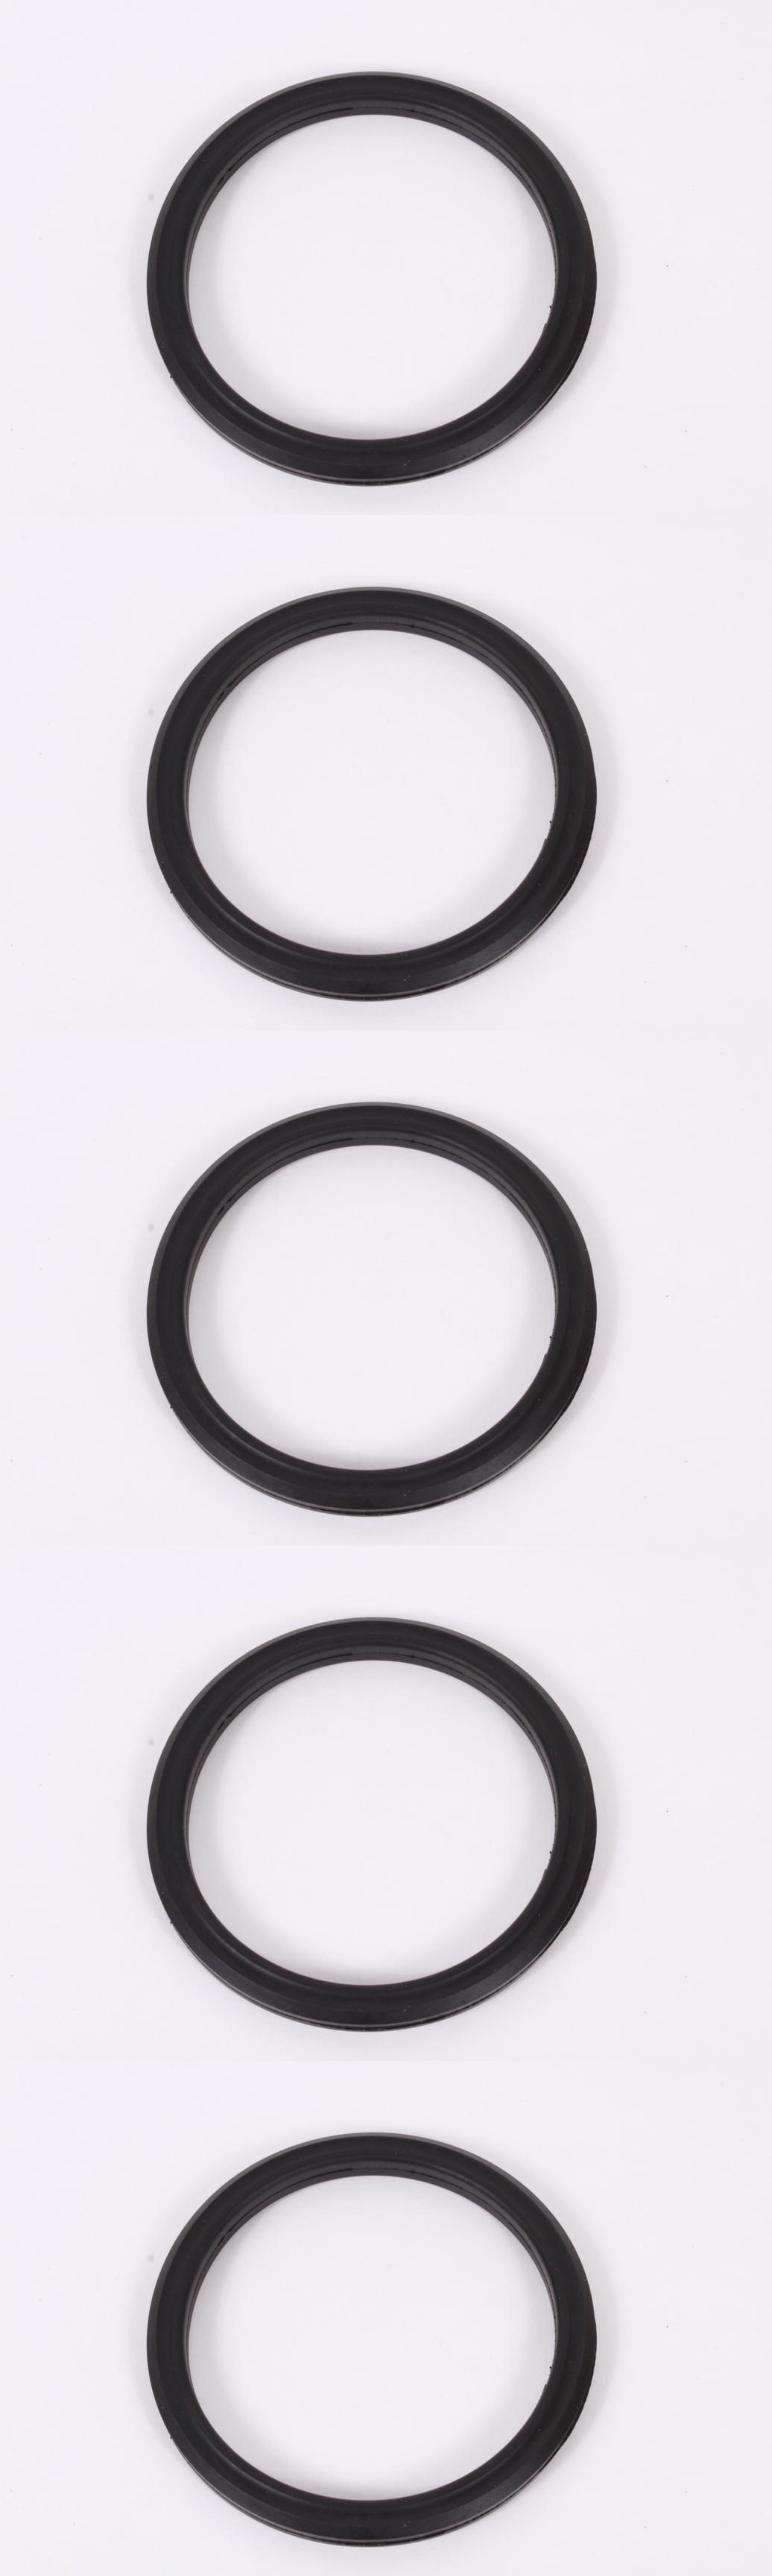 2 Pack Friction Wheel Fits MTD Craftsman Huskee Troy Bilt 935-0243B 735-0243B